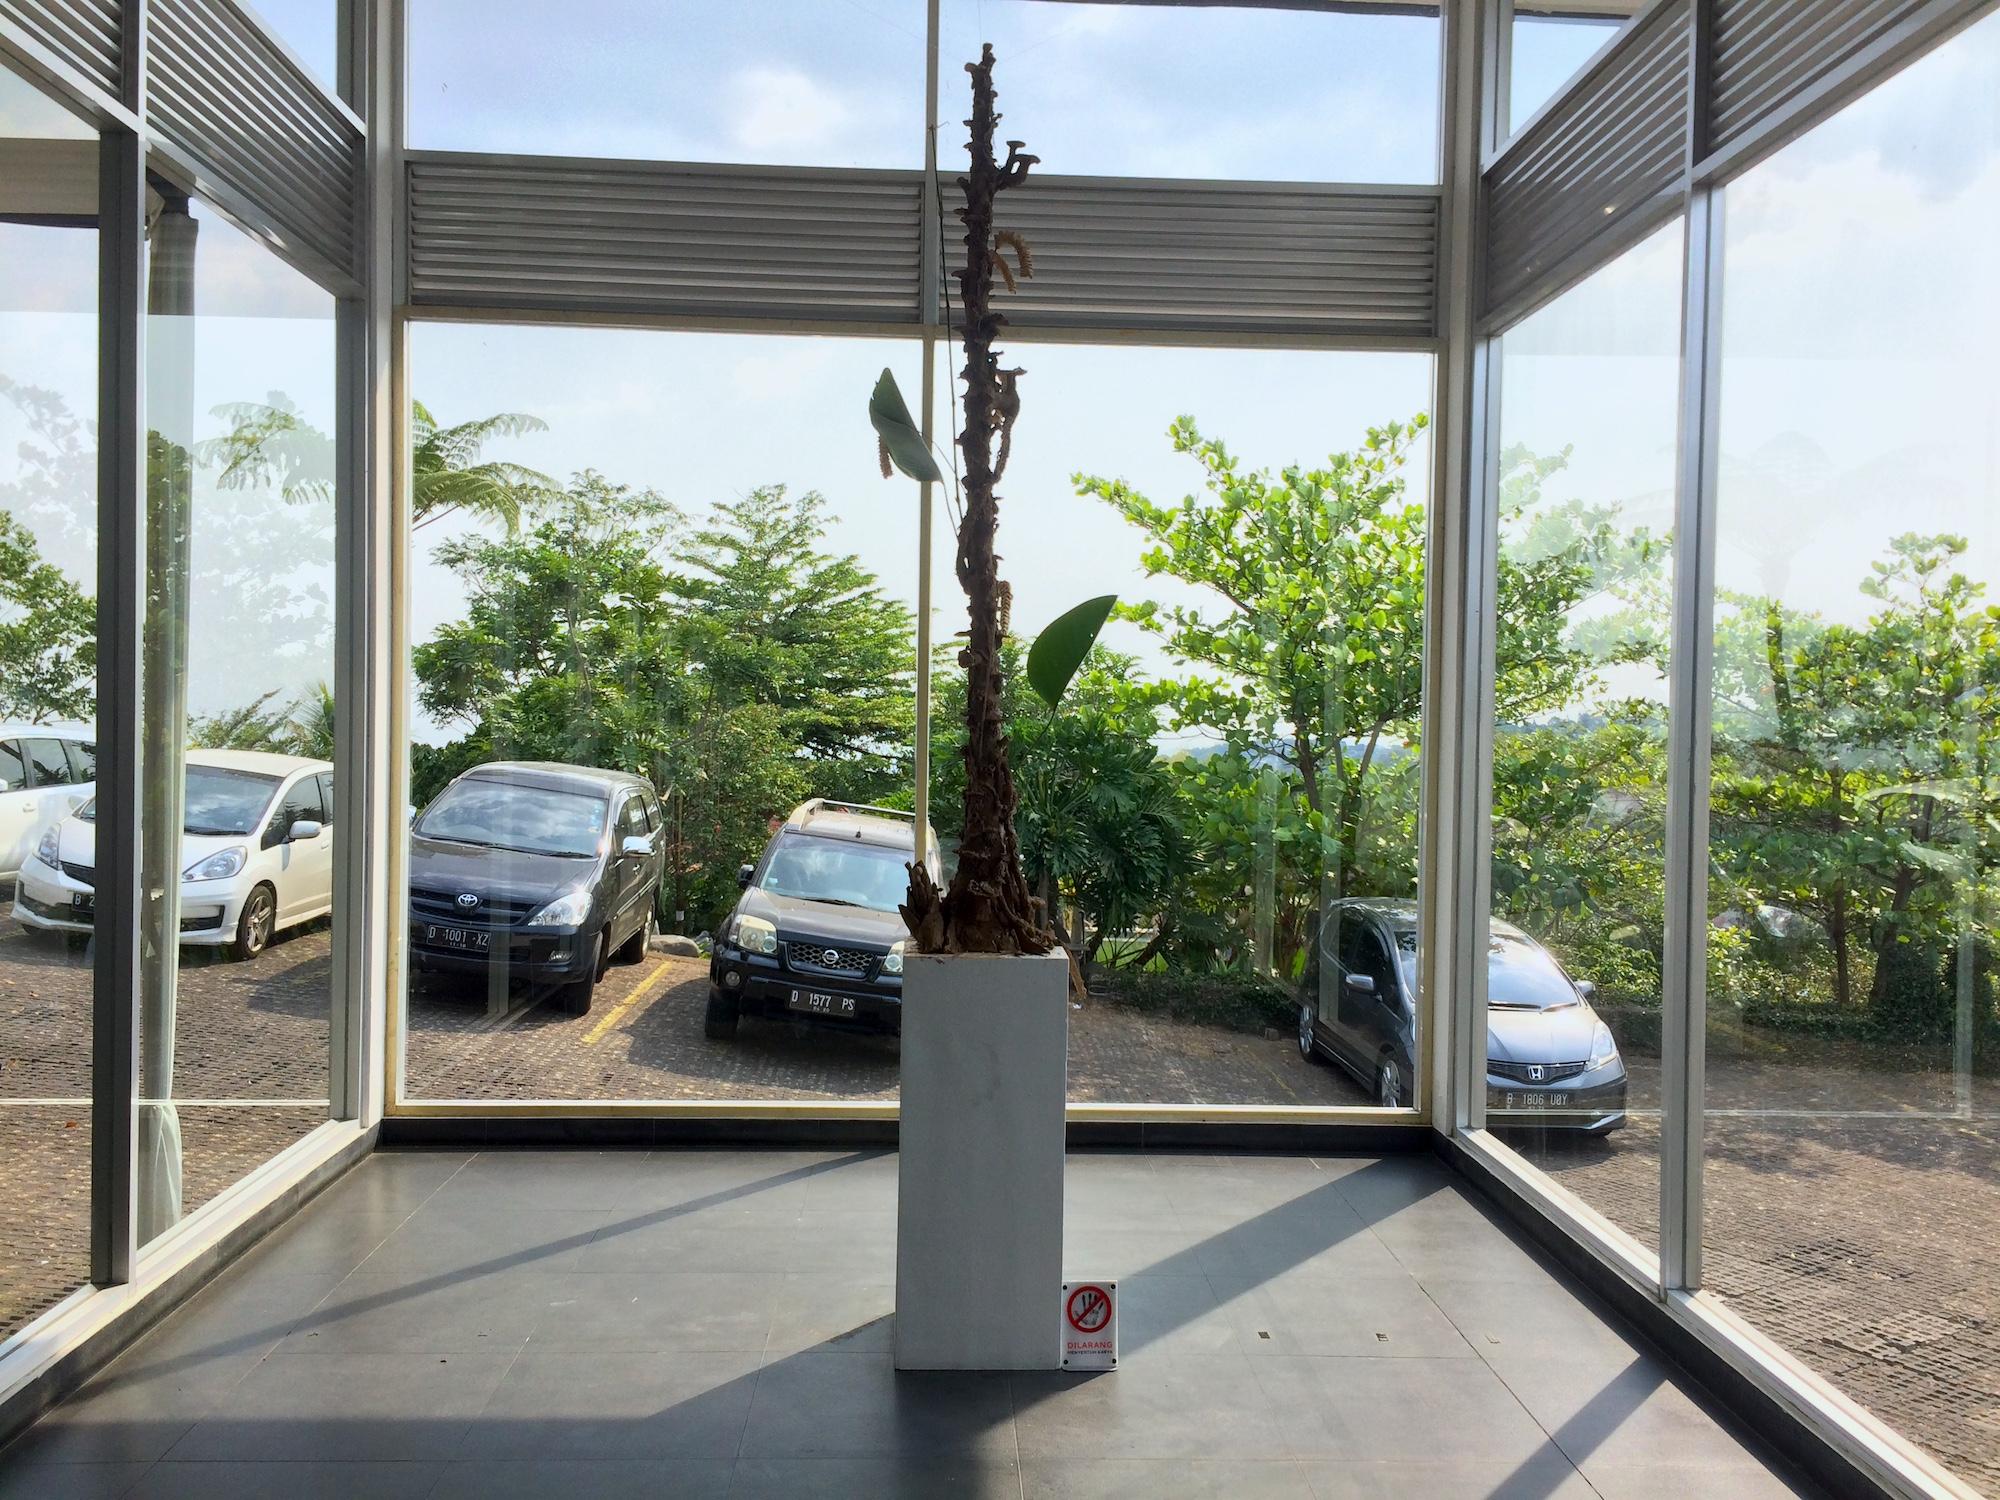 Richard Streitmatter-Tran's new exhibition at Lawangwangi Creative Space